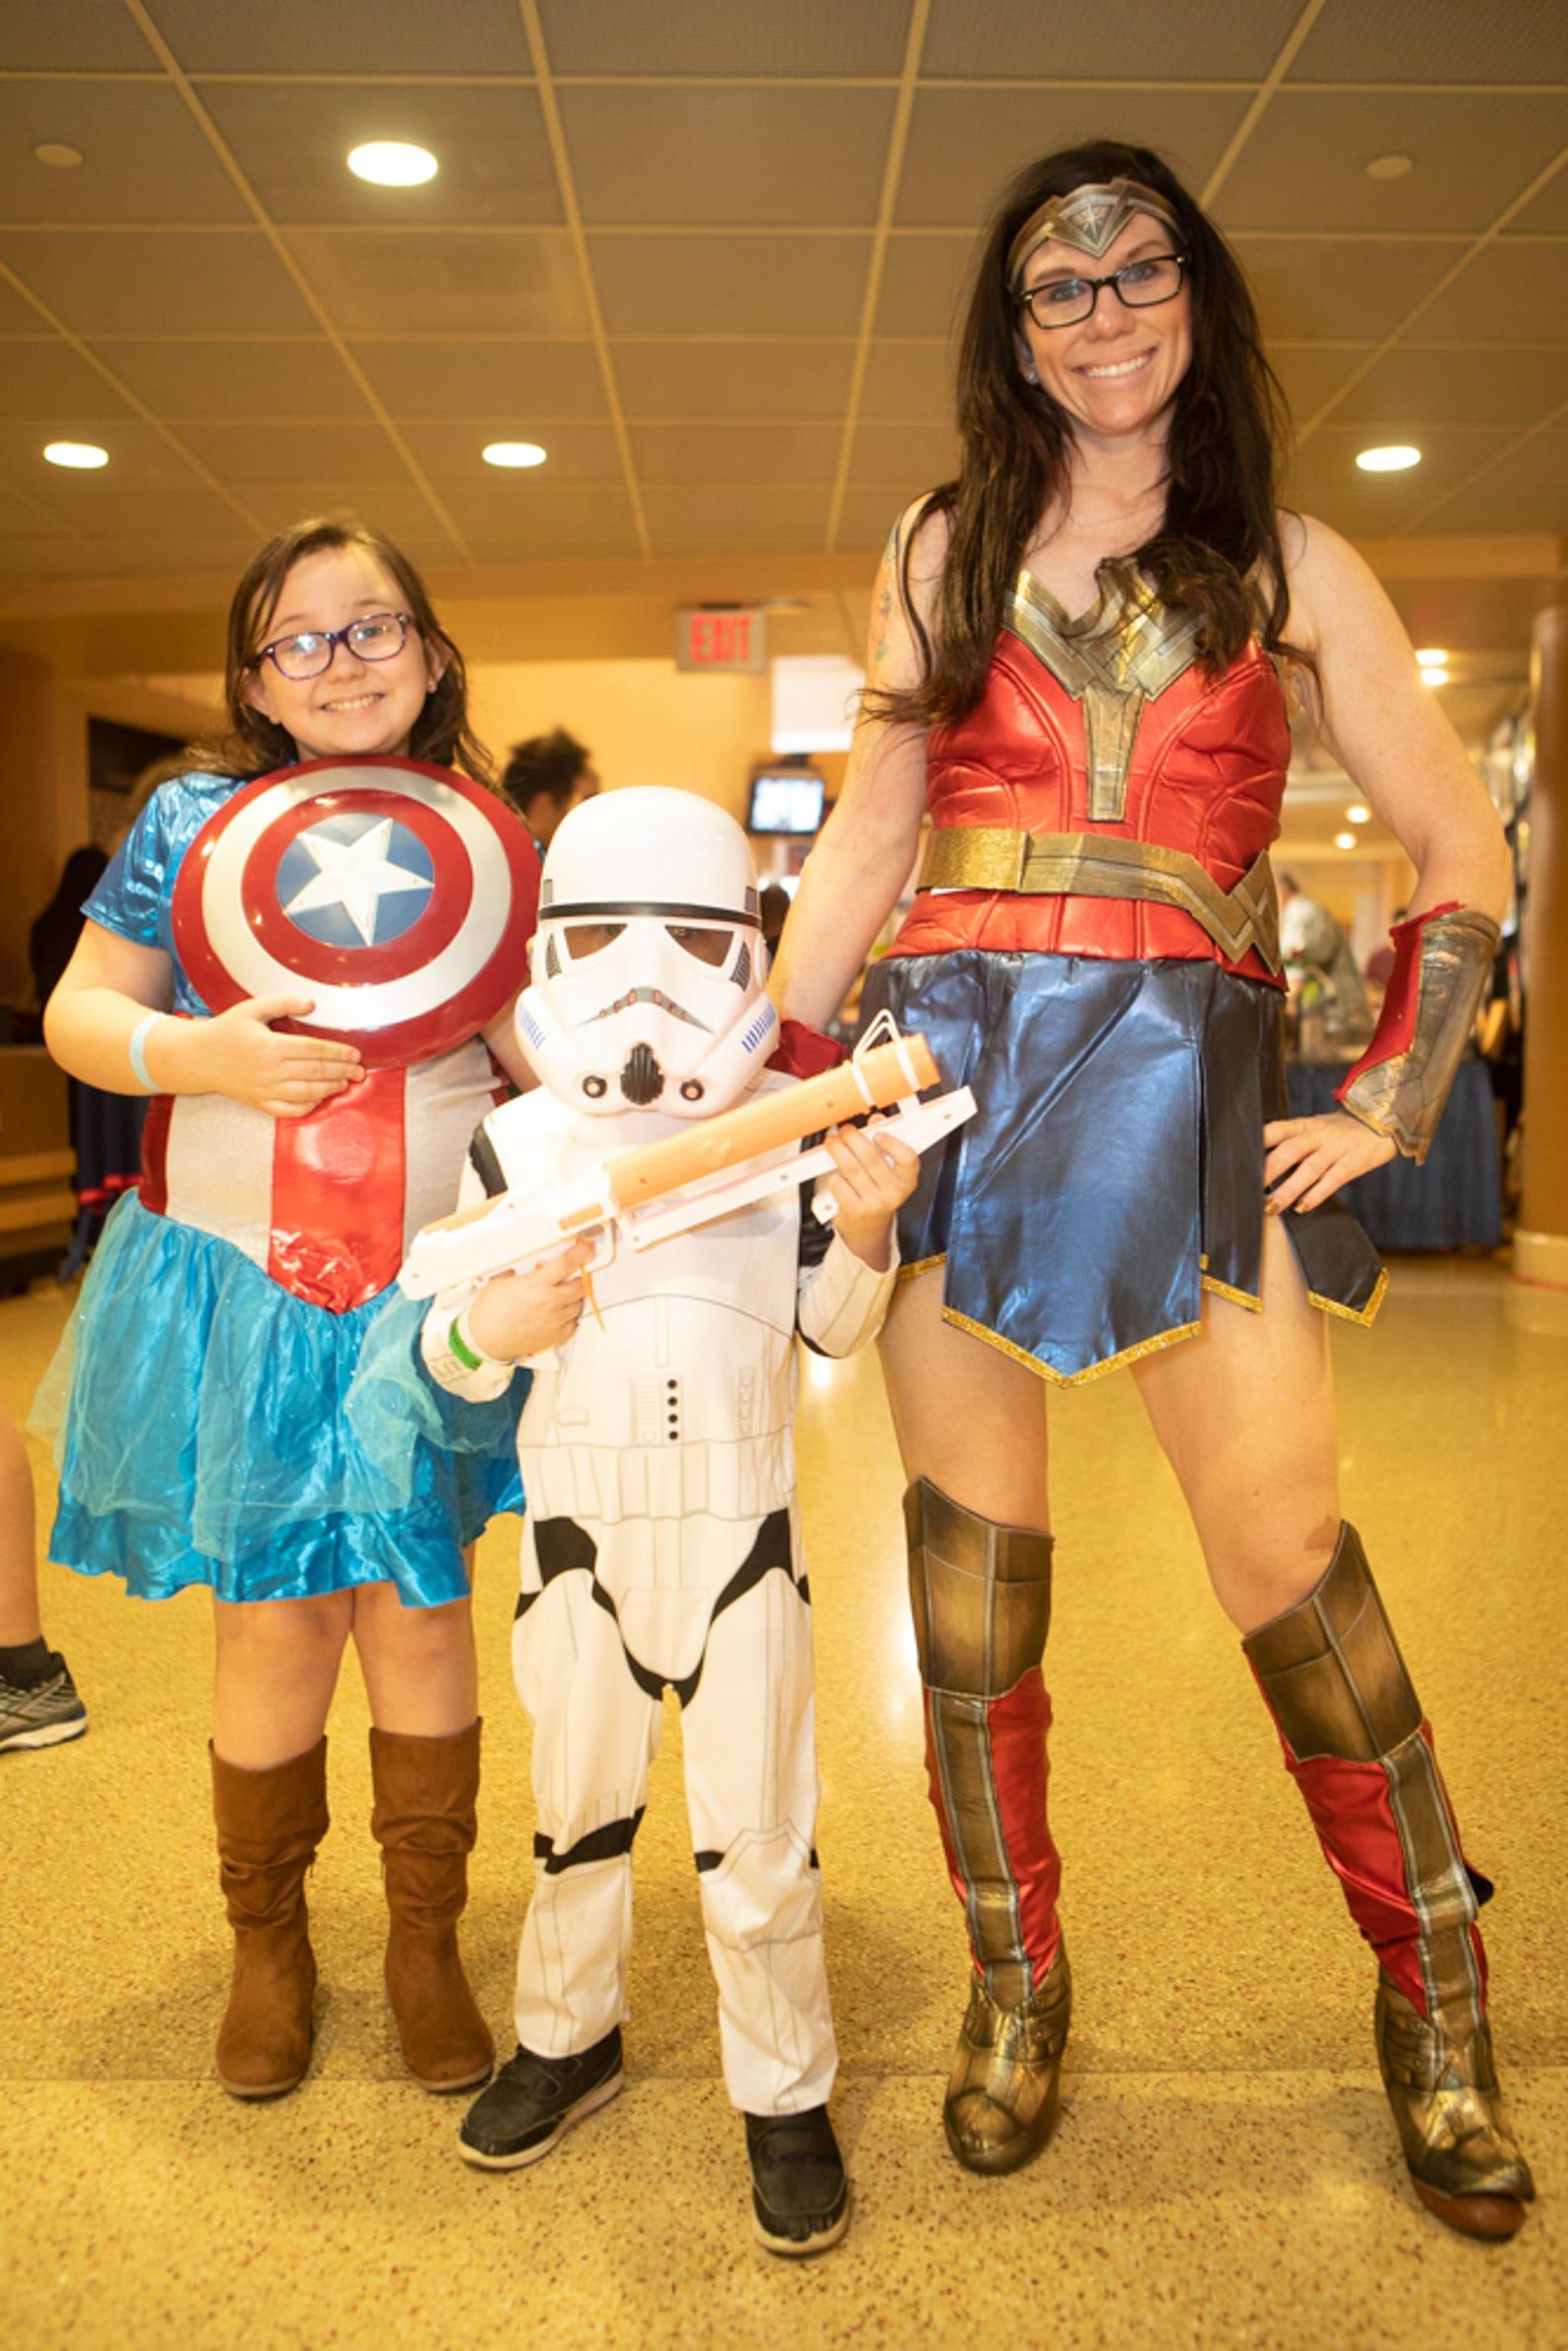 Photos: Ace Comic Con 2019 at Gila River Arena in Glendale